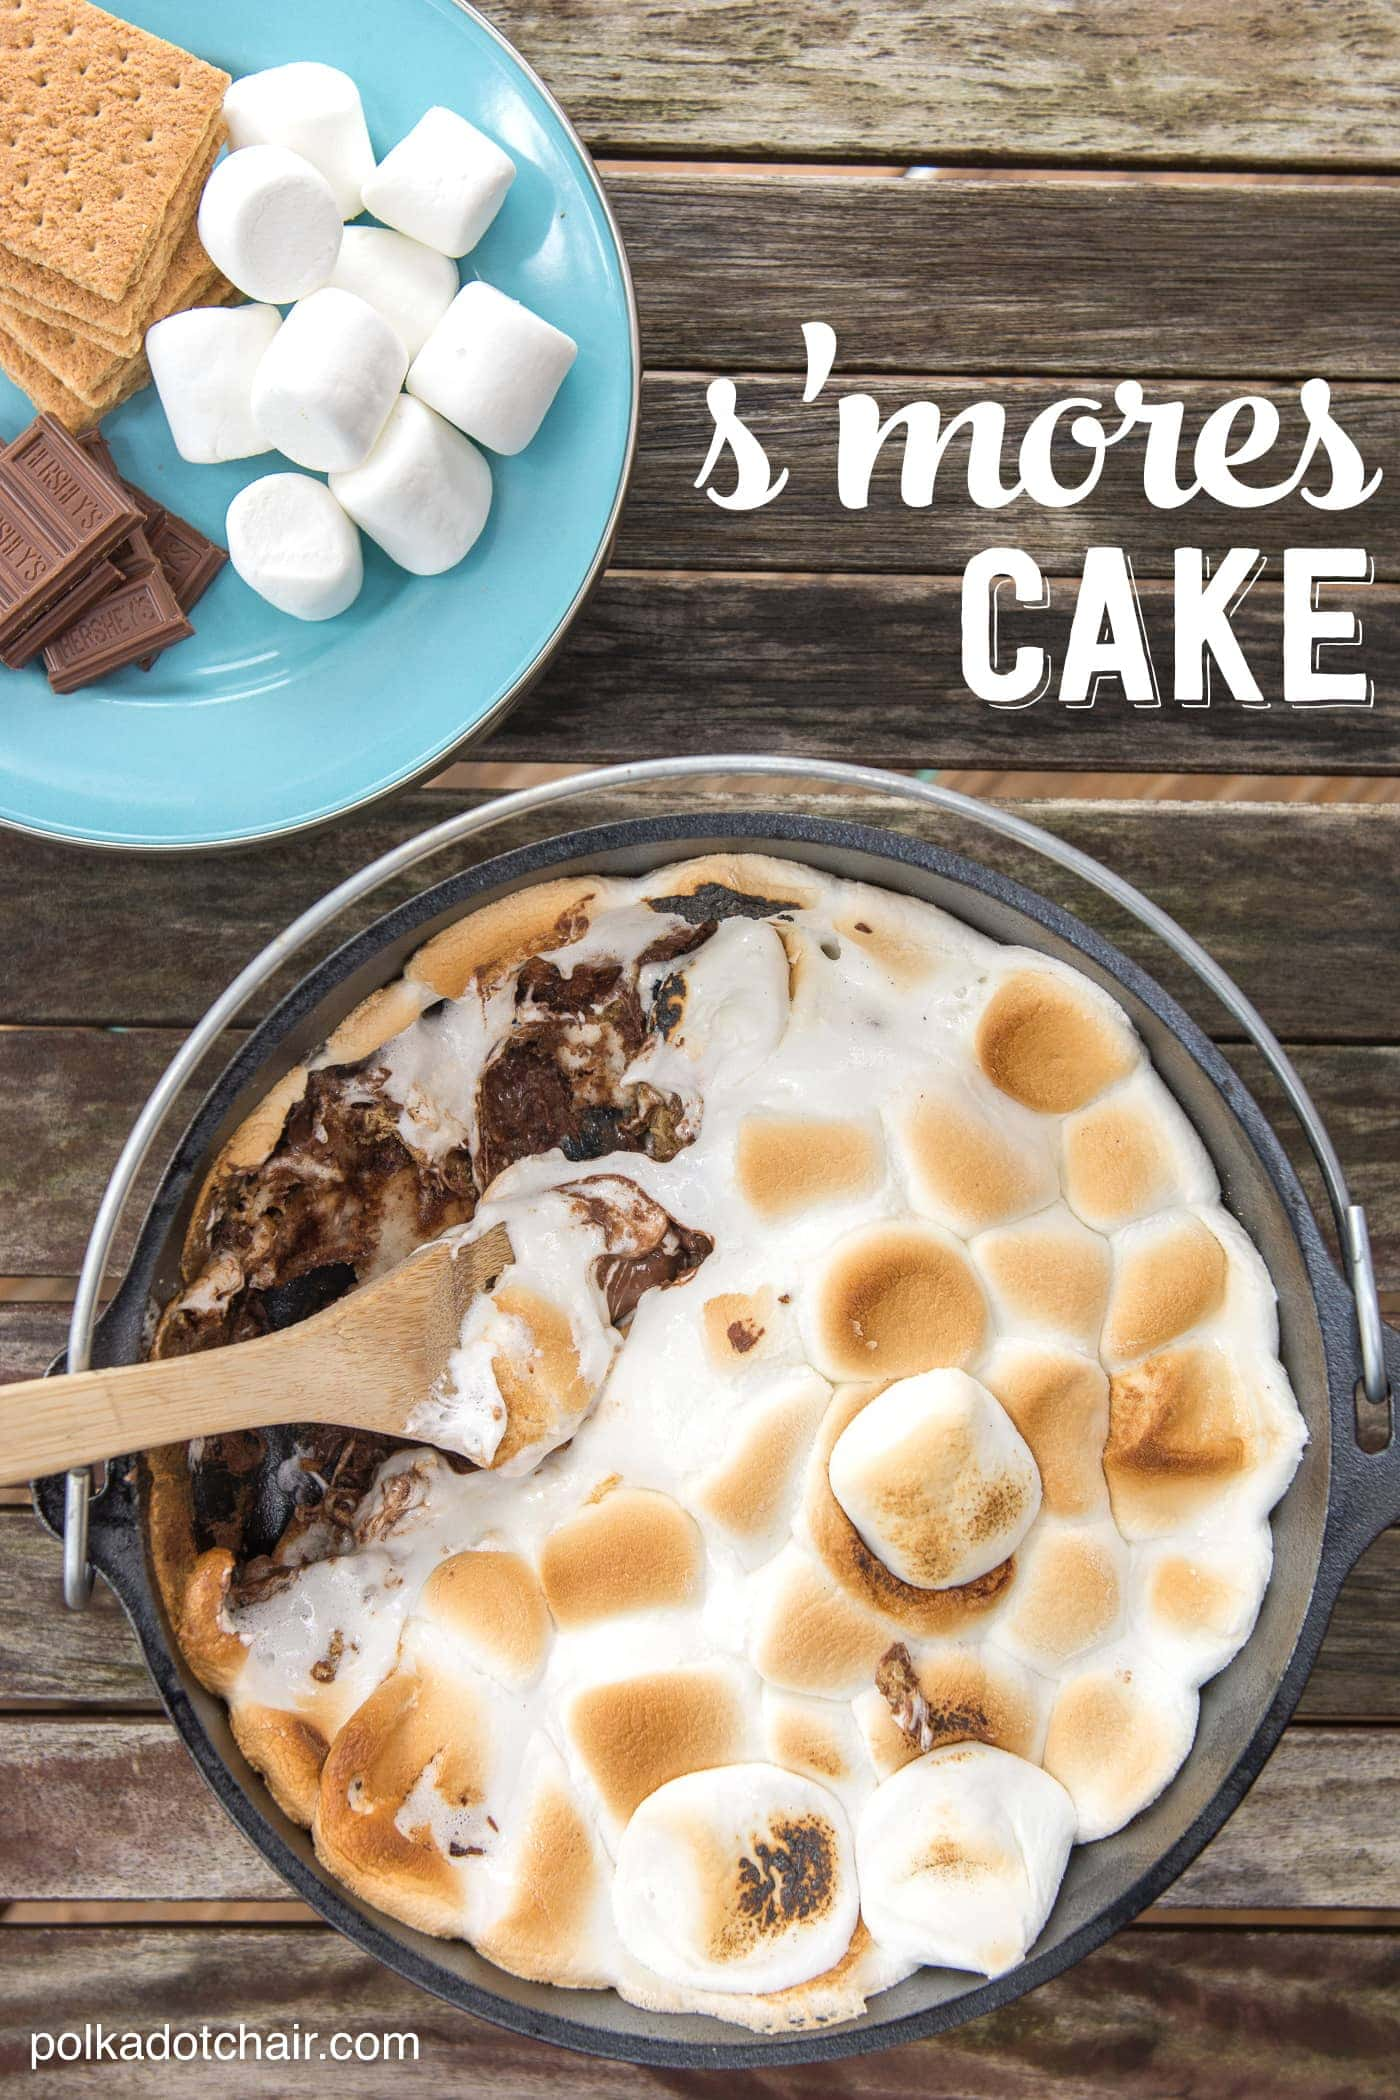 10 Minute Dutch Oven S Mores Cake Recipe